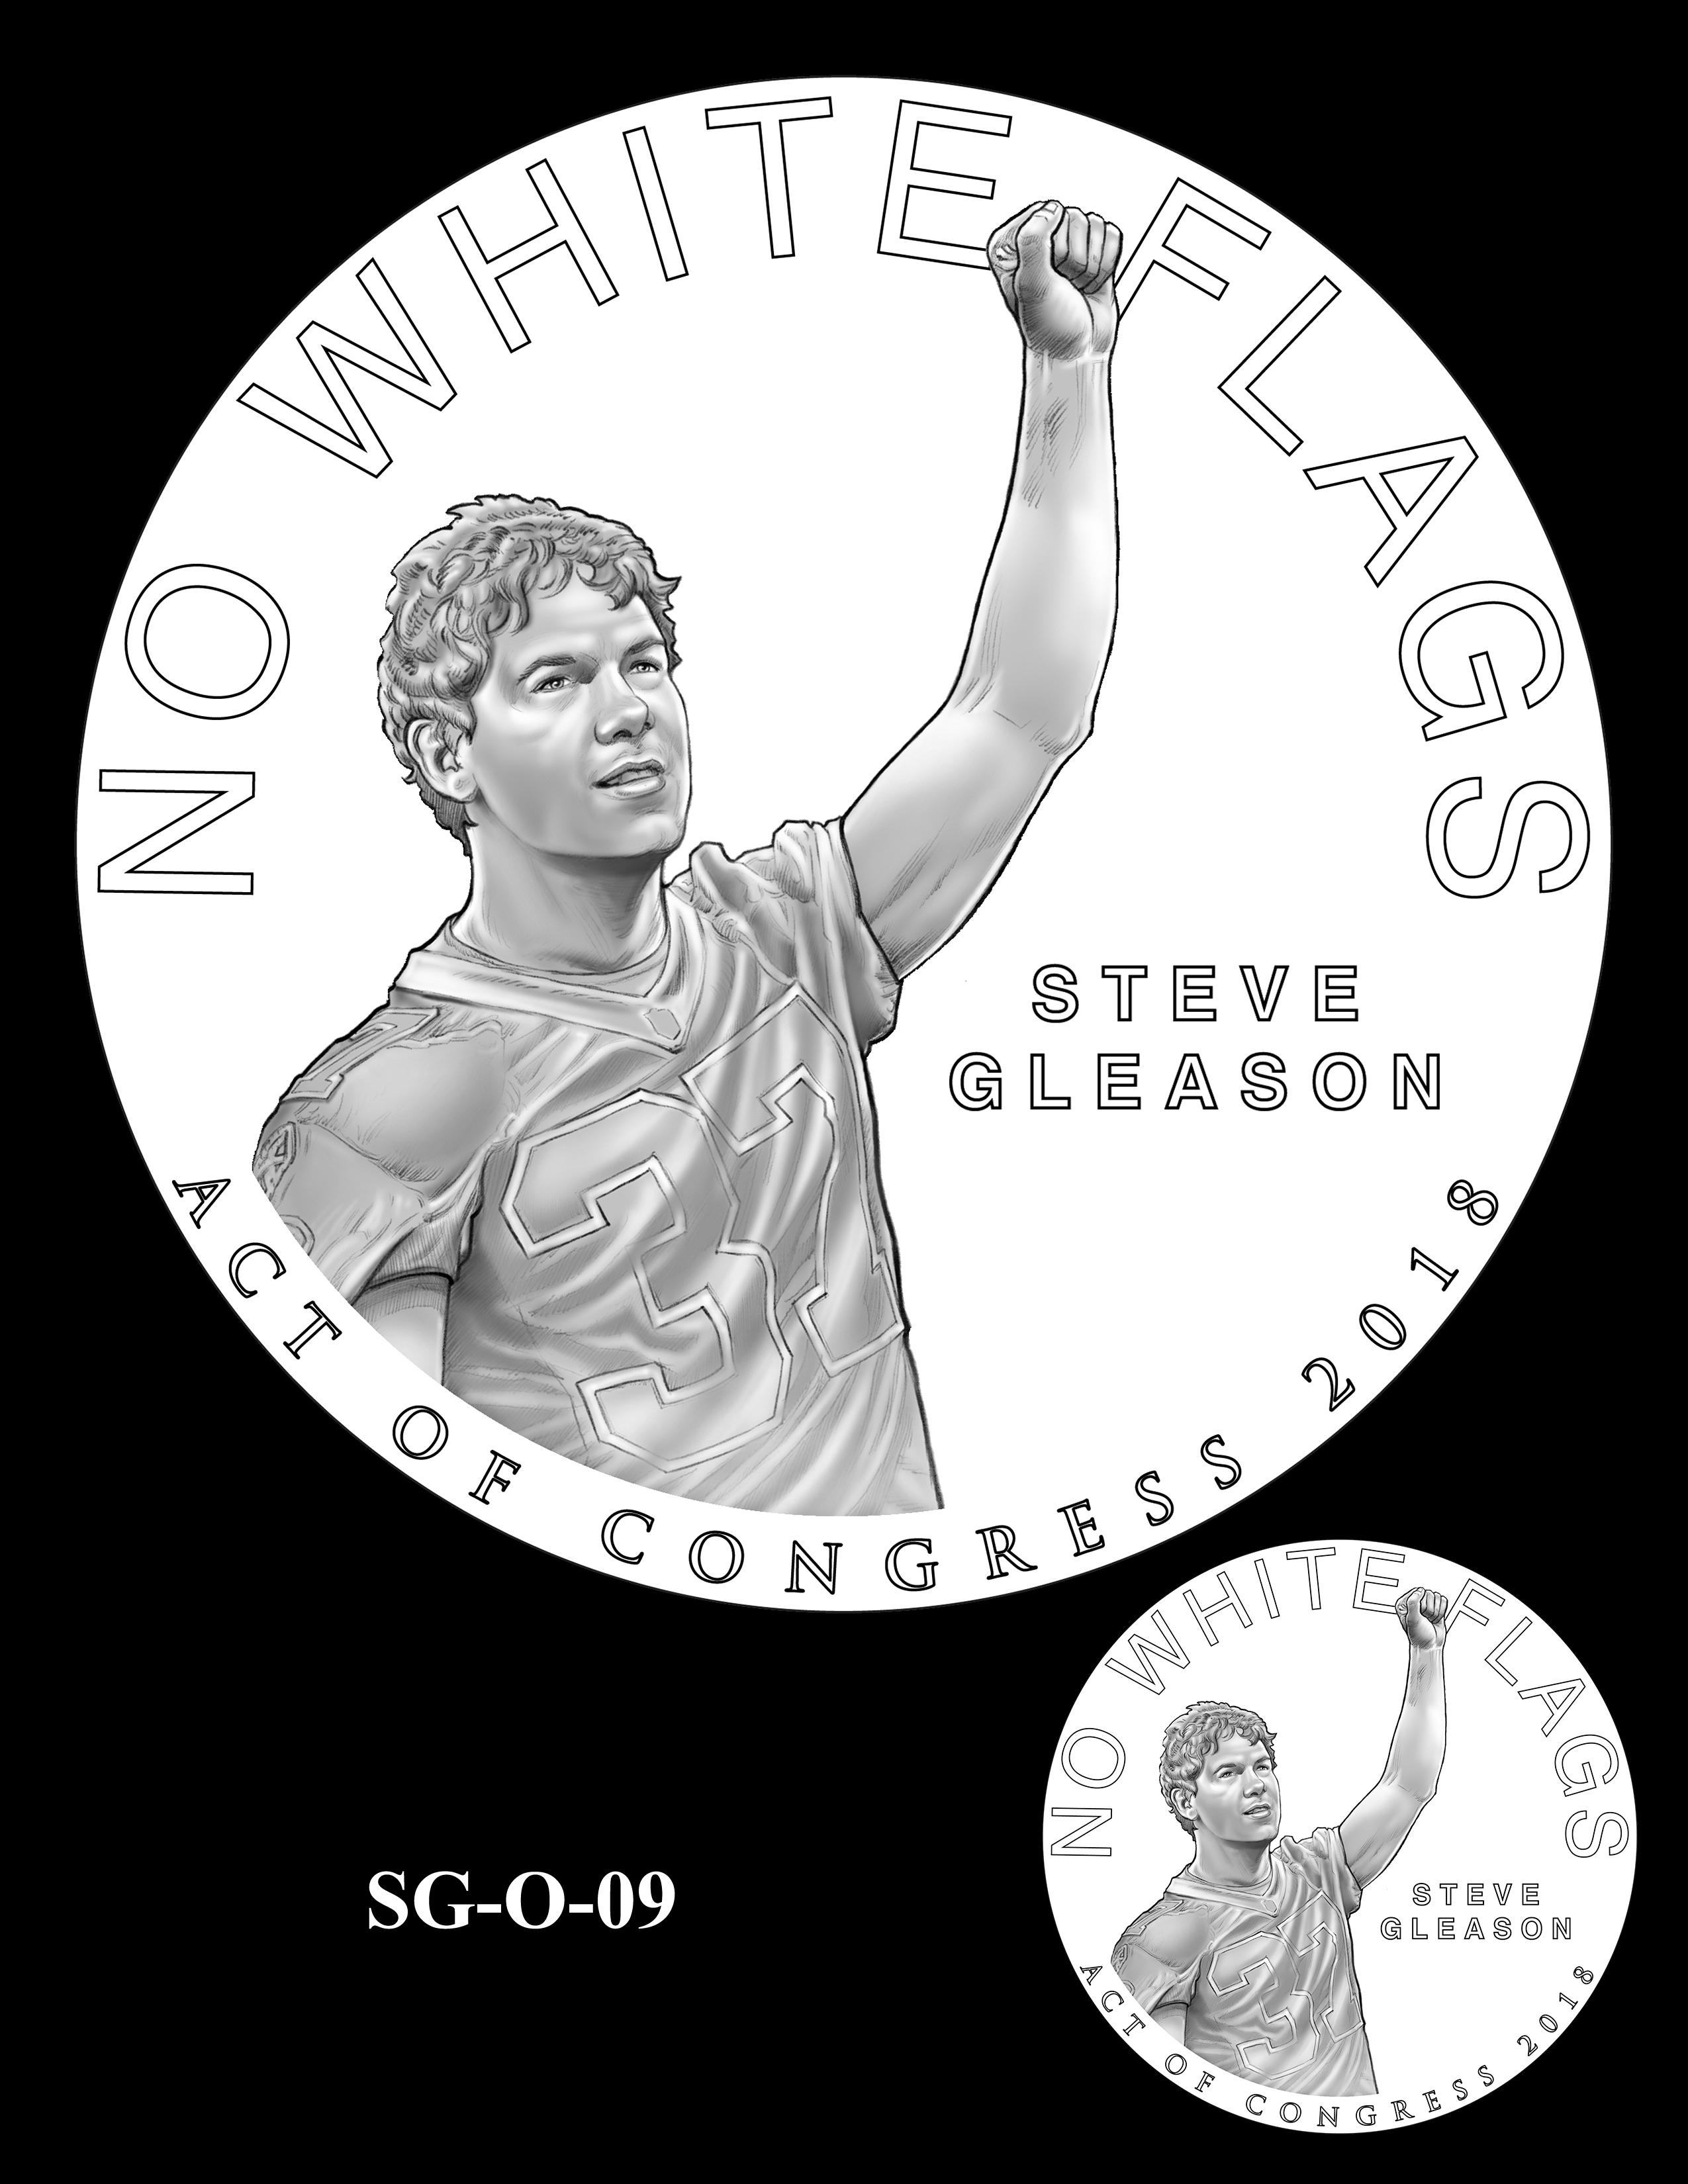 SG-O-09 -- Steve Gleason CGM Obverse